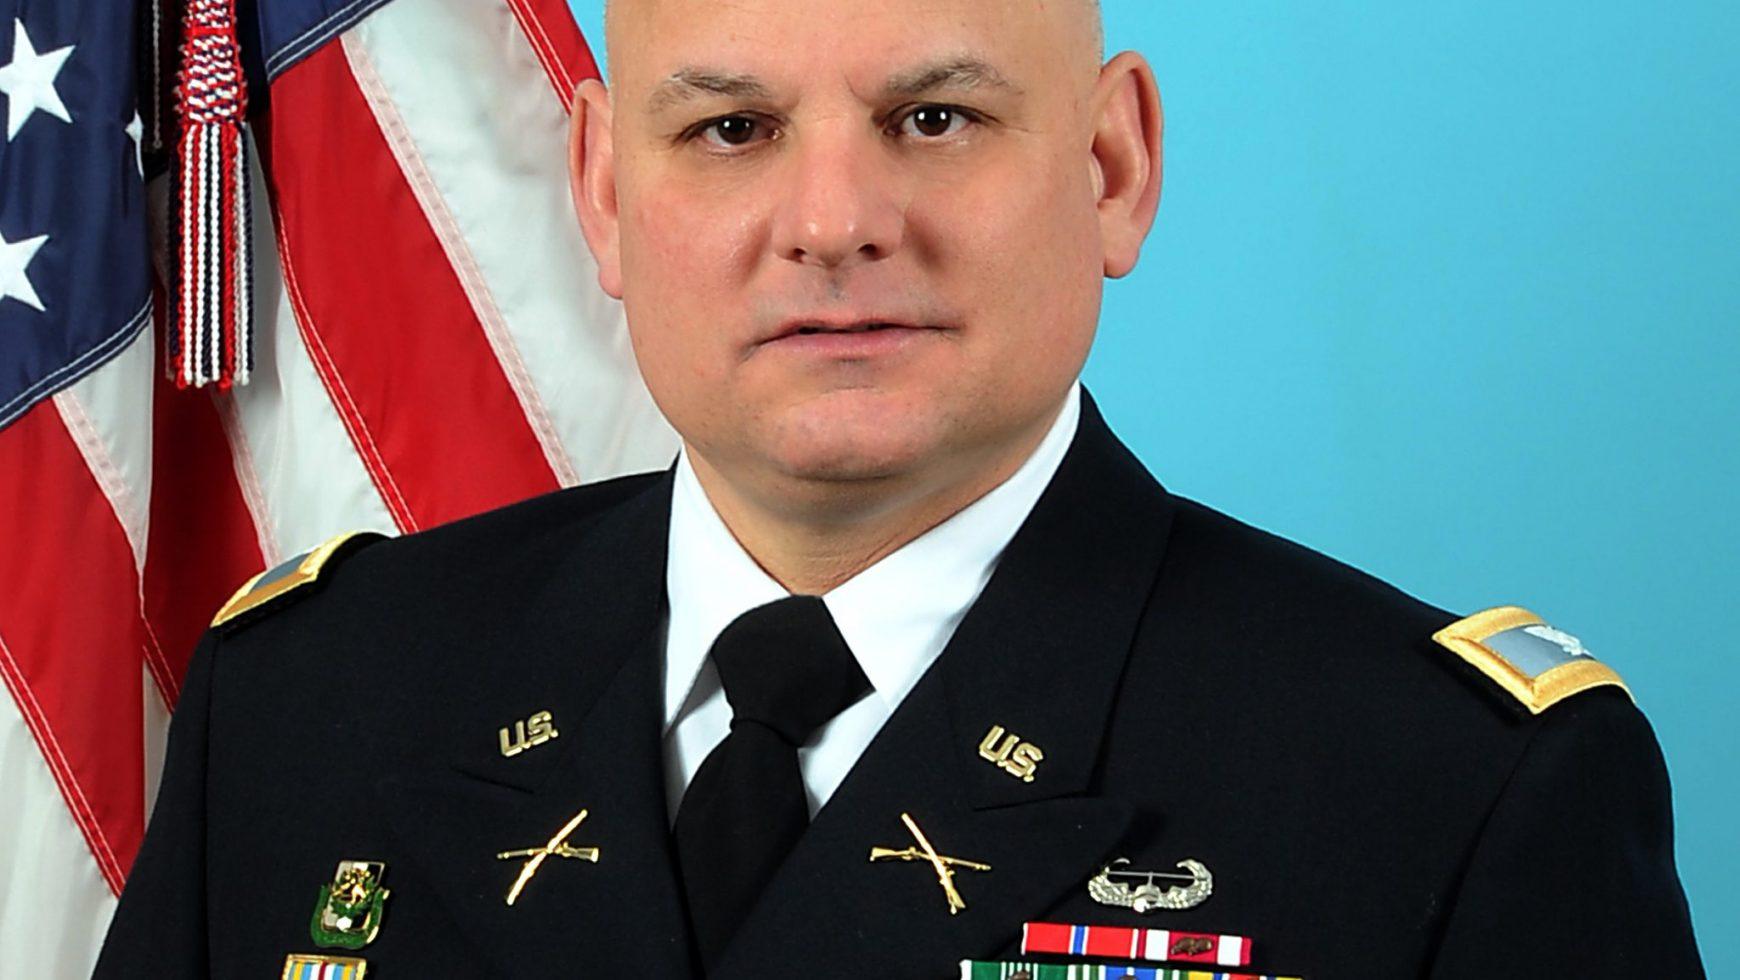 Michael Floru